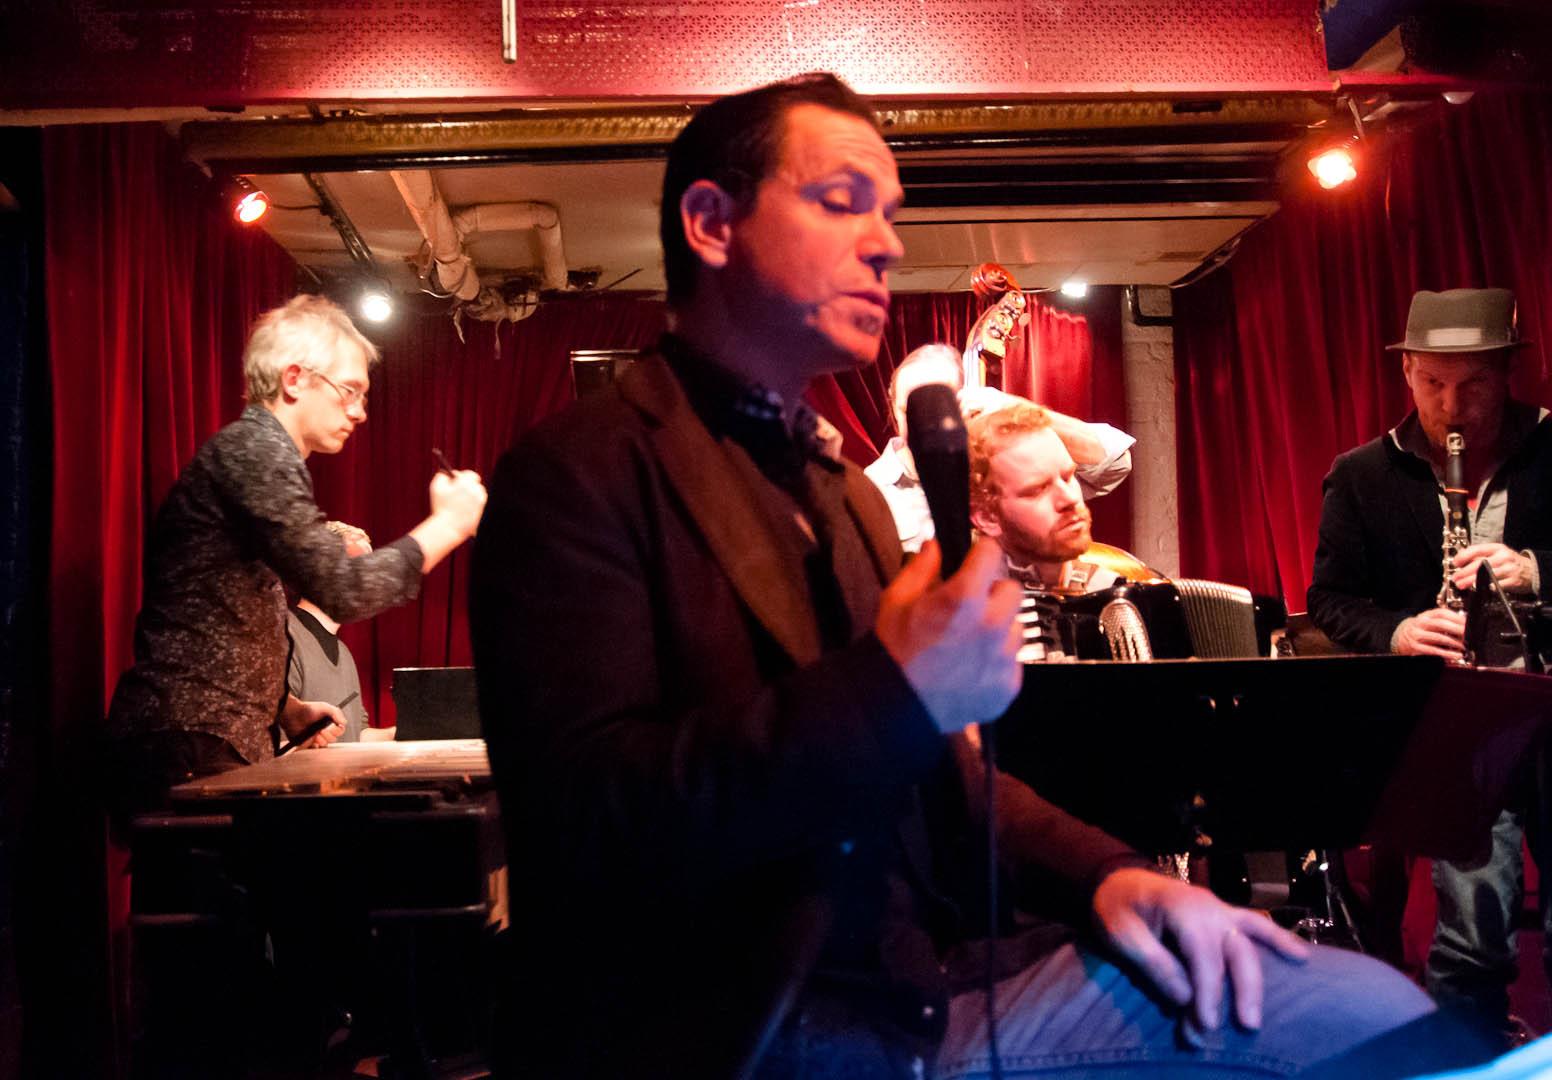 Matt Moran, Kurt Elling, Red Wieringa, Drew Gress and Chris Speed with the Claudia Quintet at the Cornelia Street Cafe